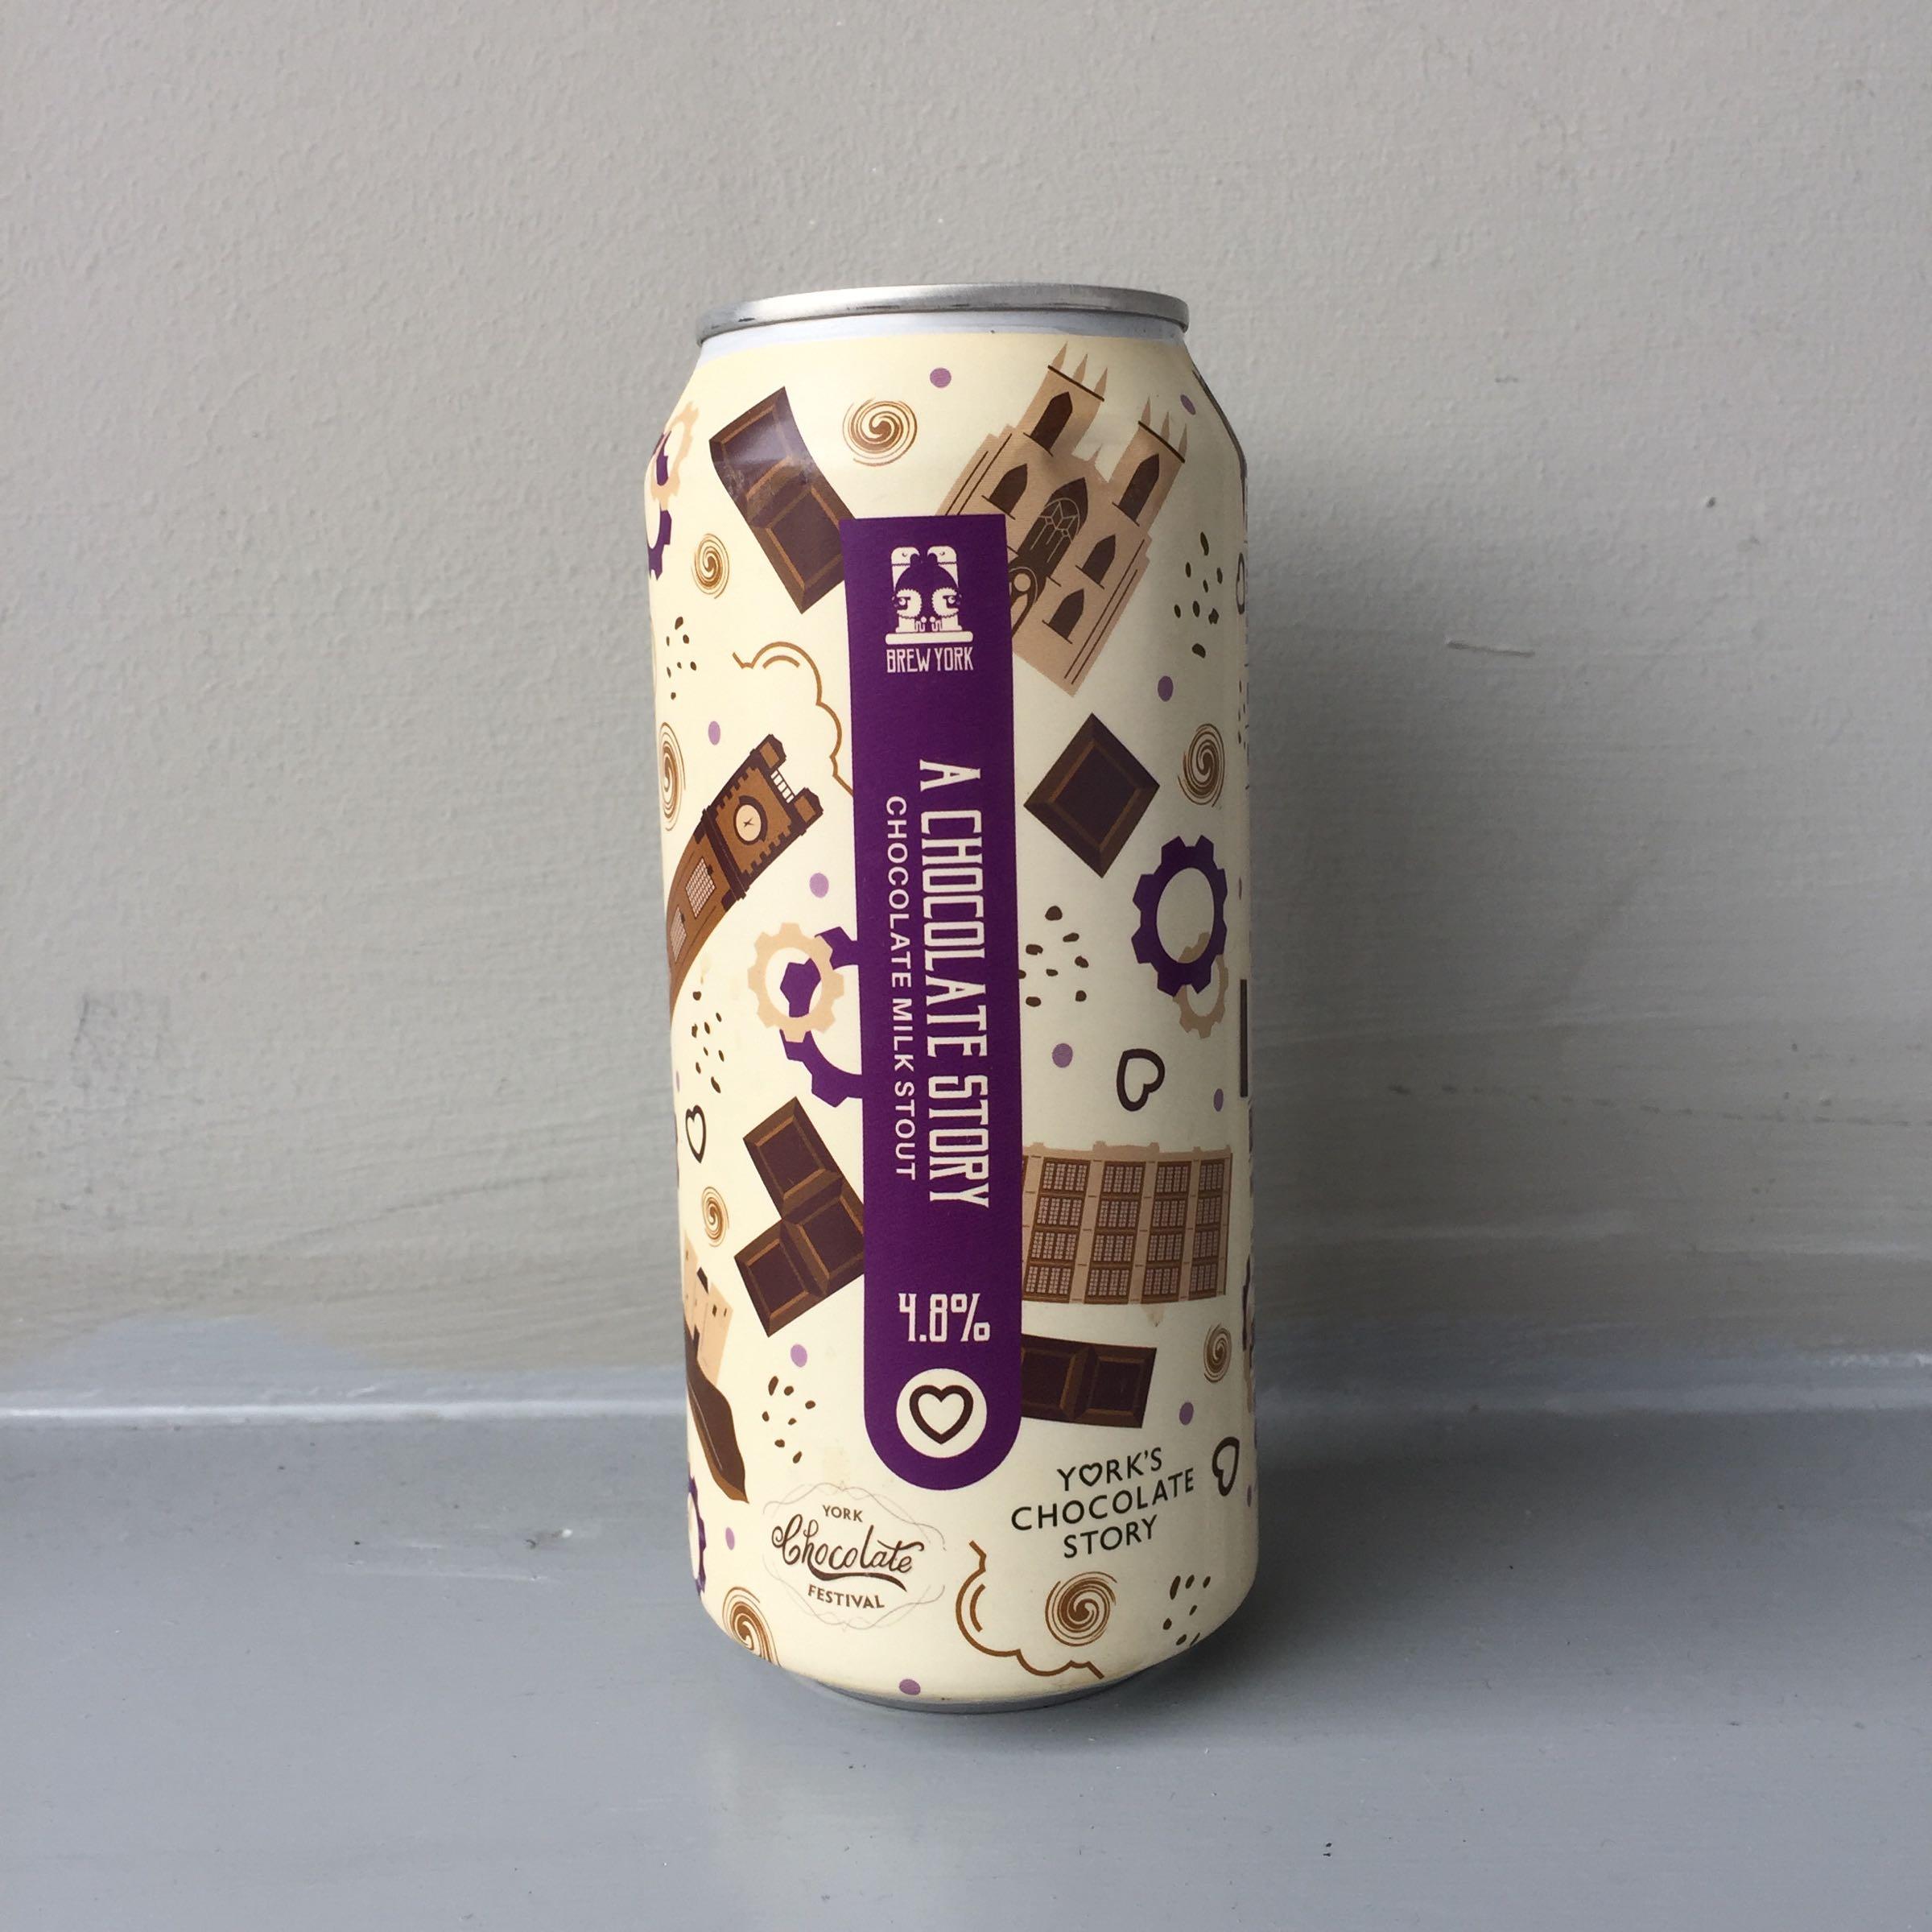 Brew York 'A Chocolate Story' Chocolate Stout 440ml 4.8% ABV